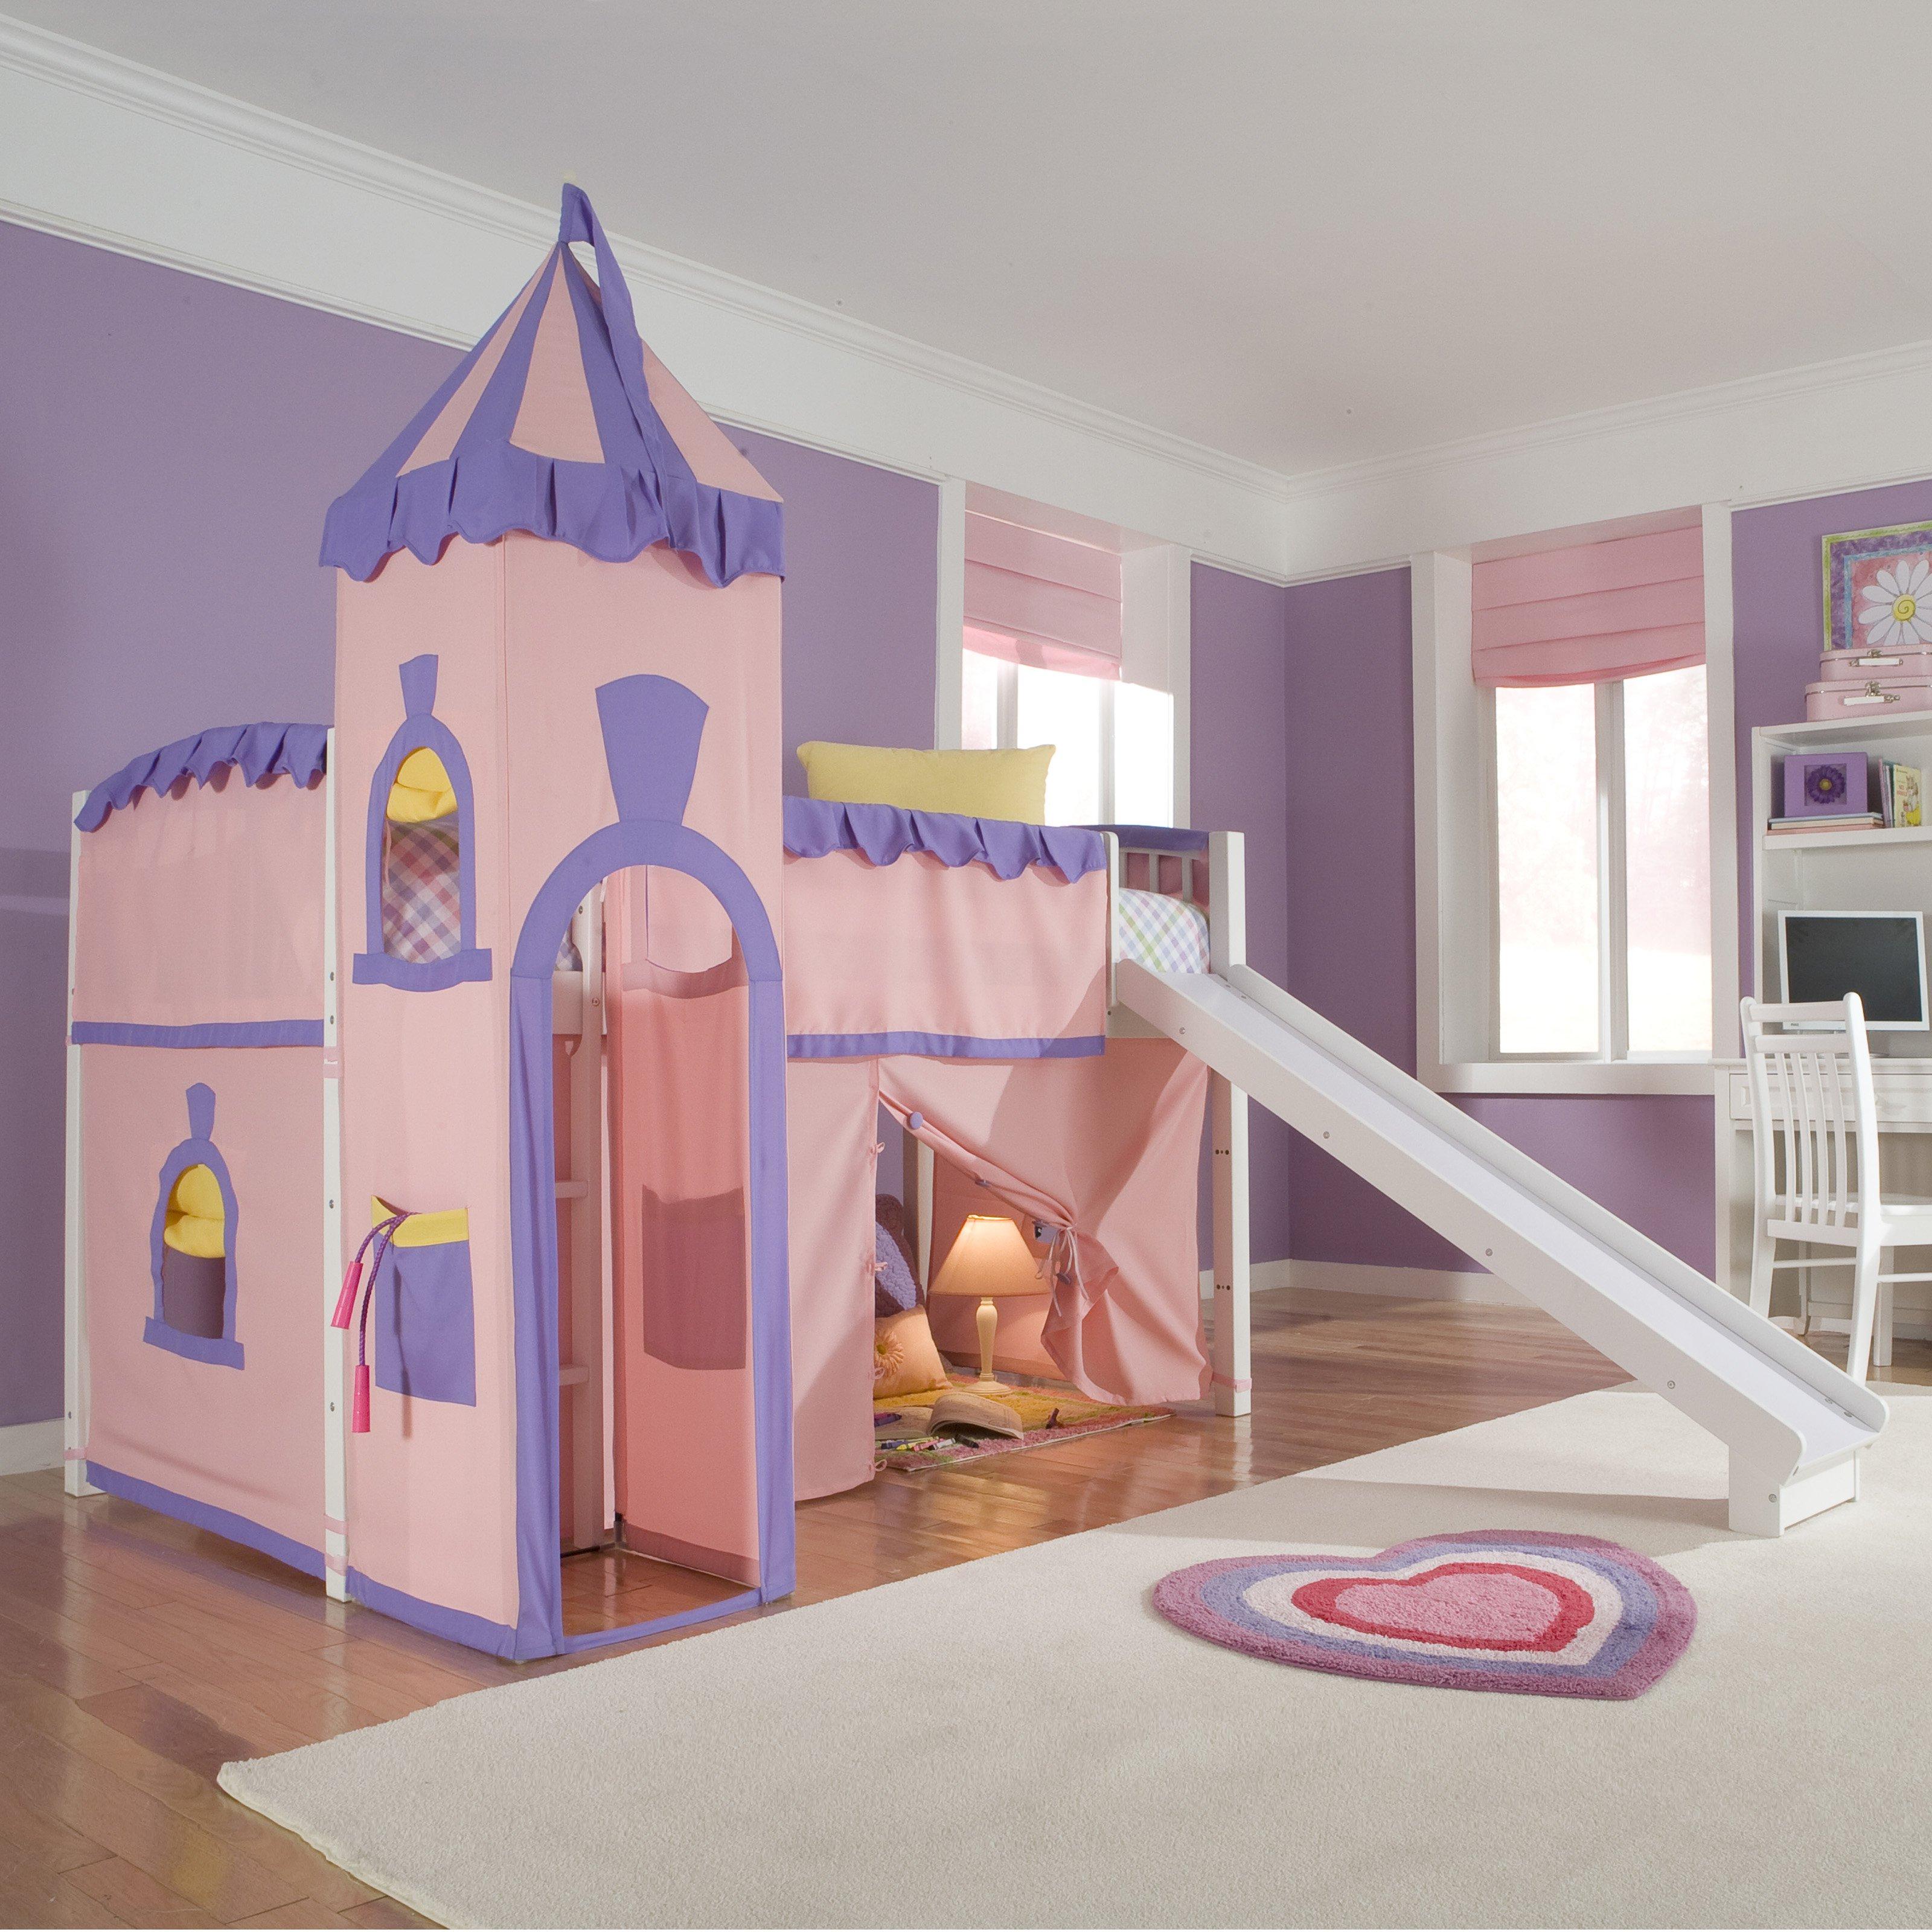 kids loft bed ne kids school house princess loft bed - walmart.com FKEJUDN